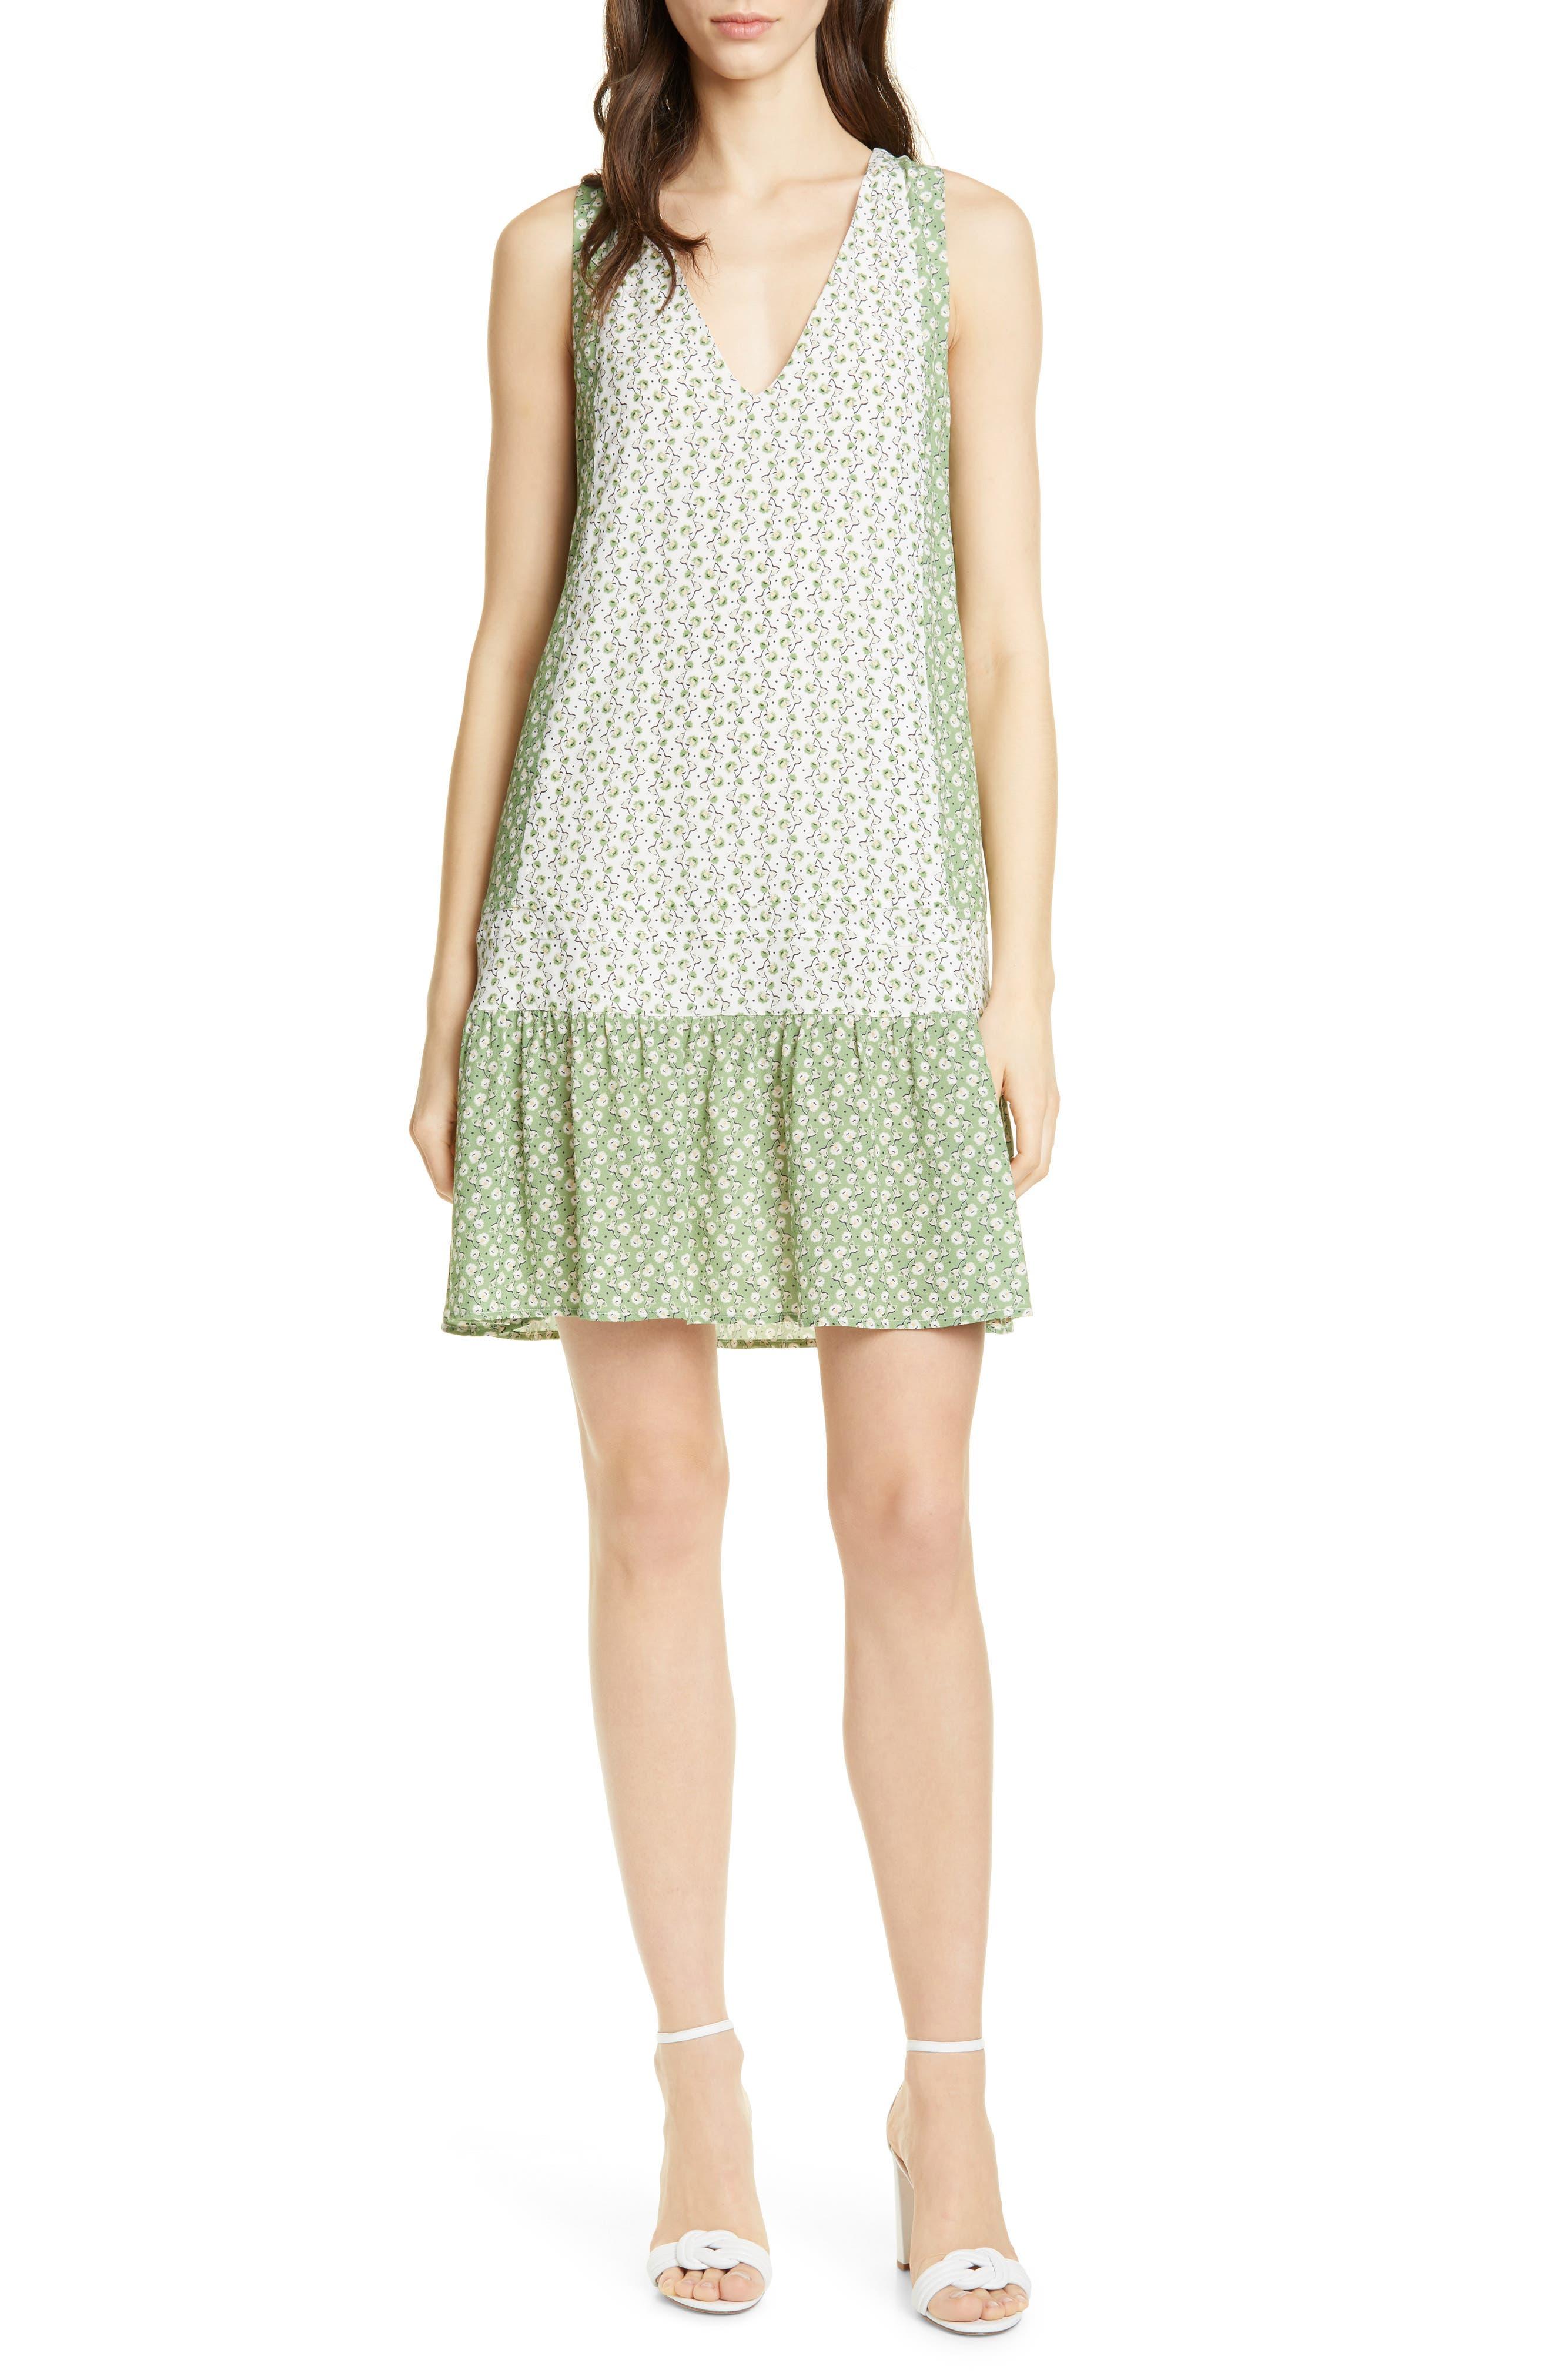 Dolan Chickie Floral Sleeveless Minidress, Green